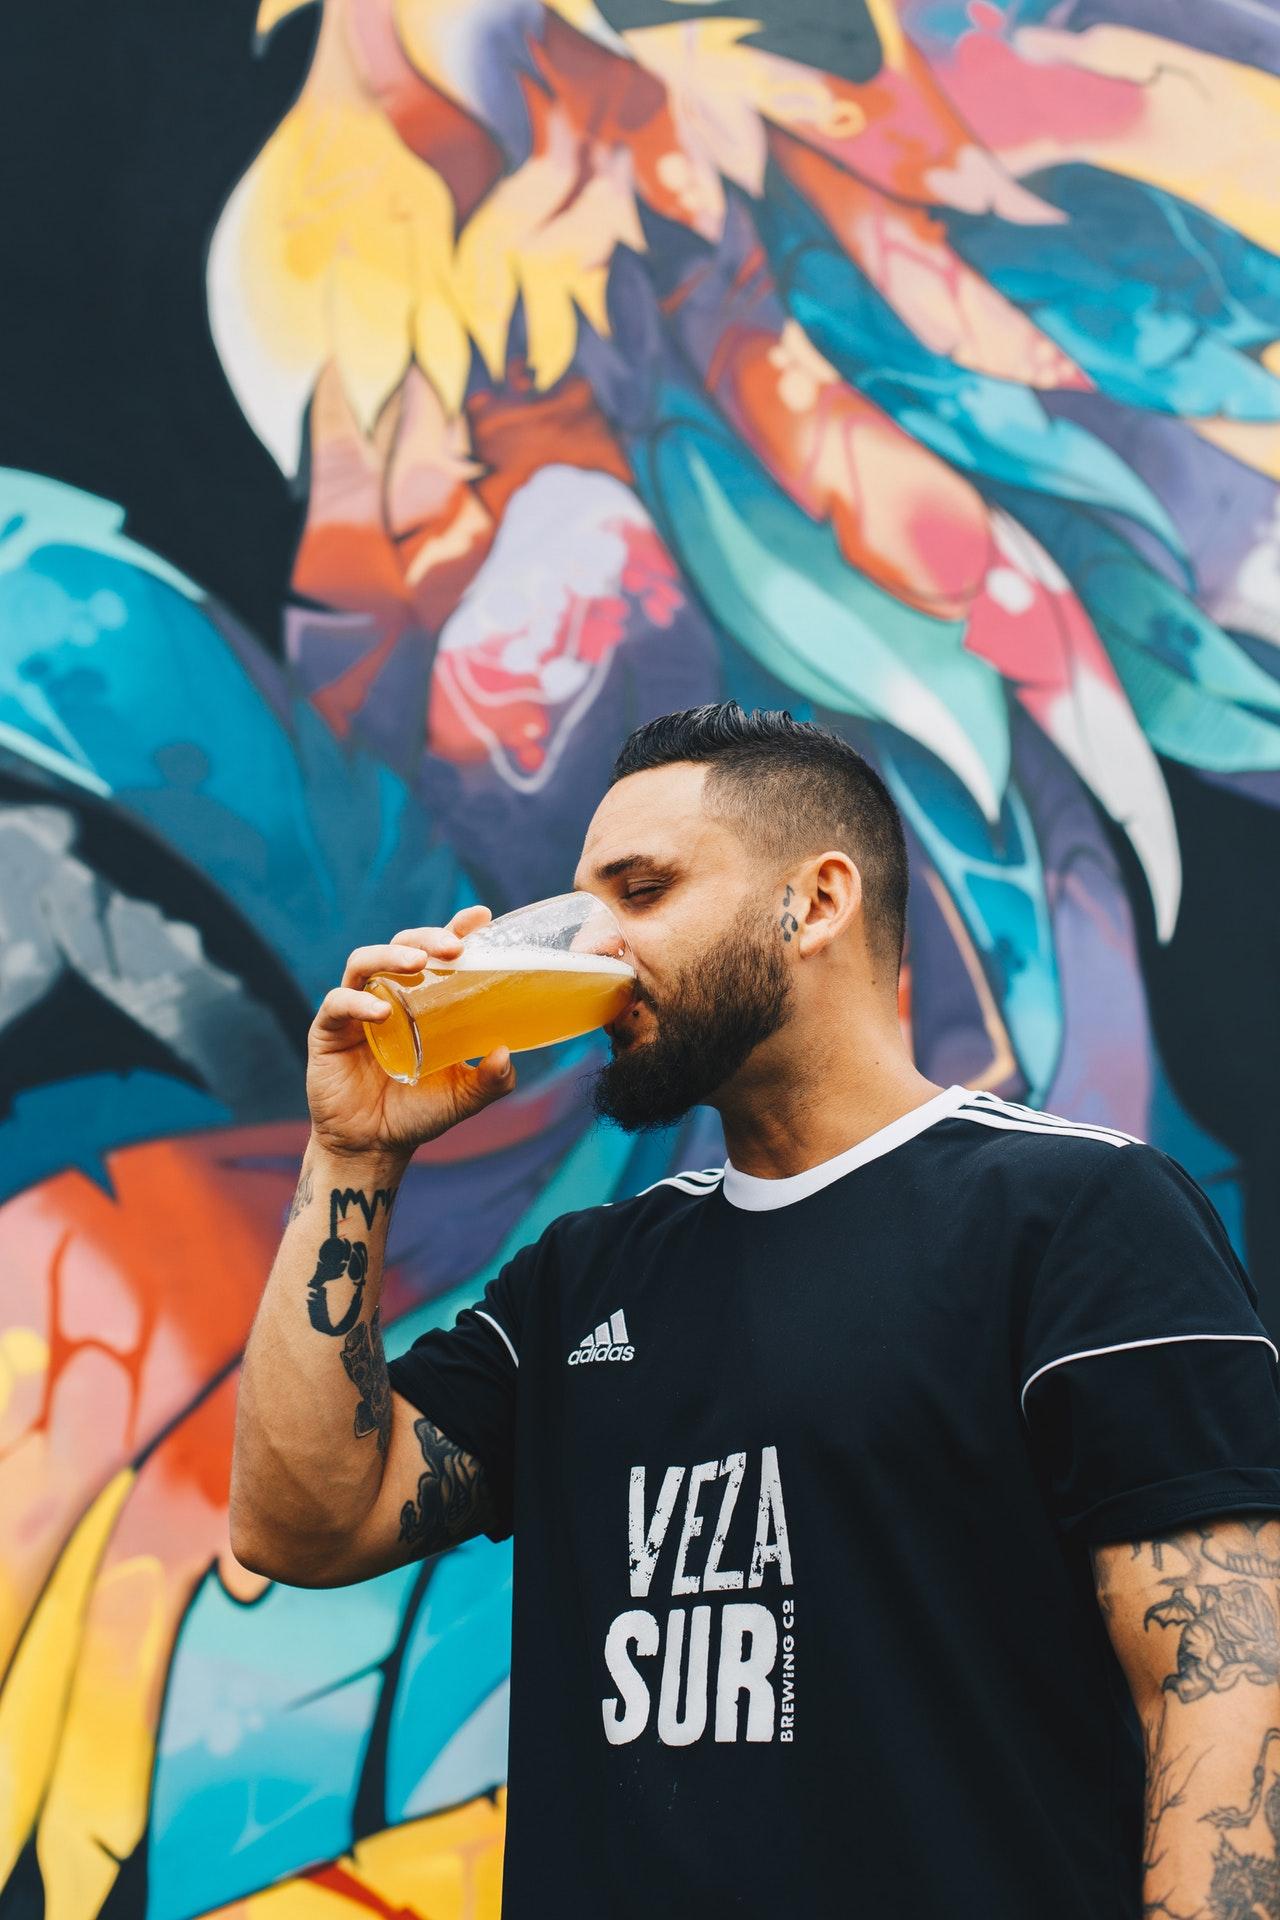 adult-alcohol-alcoholic-beverage-1267290.jpg